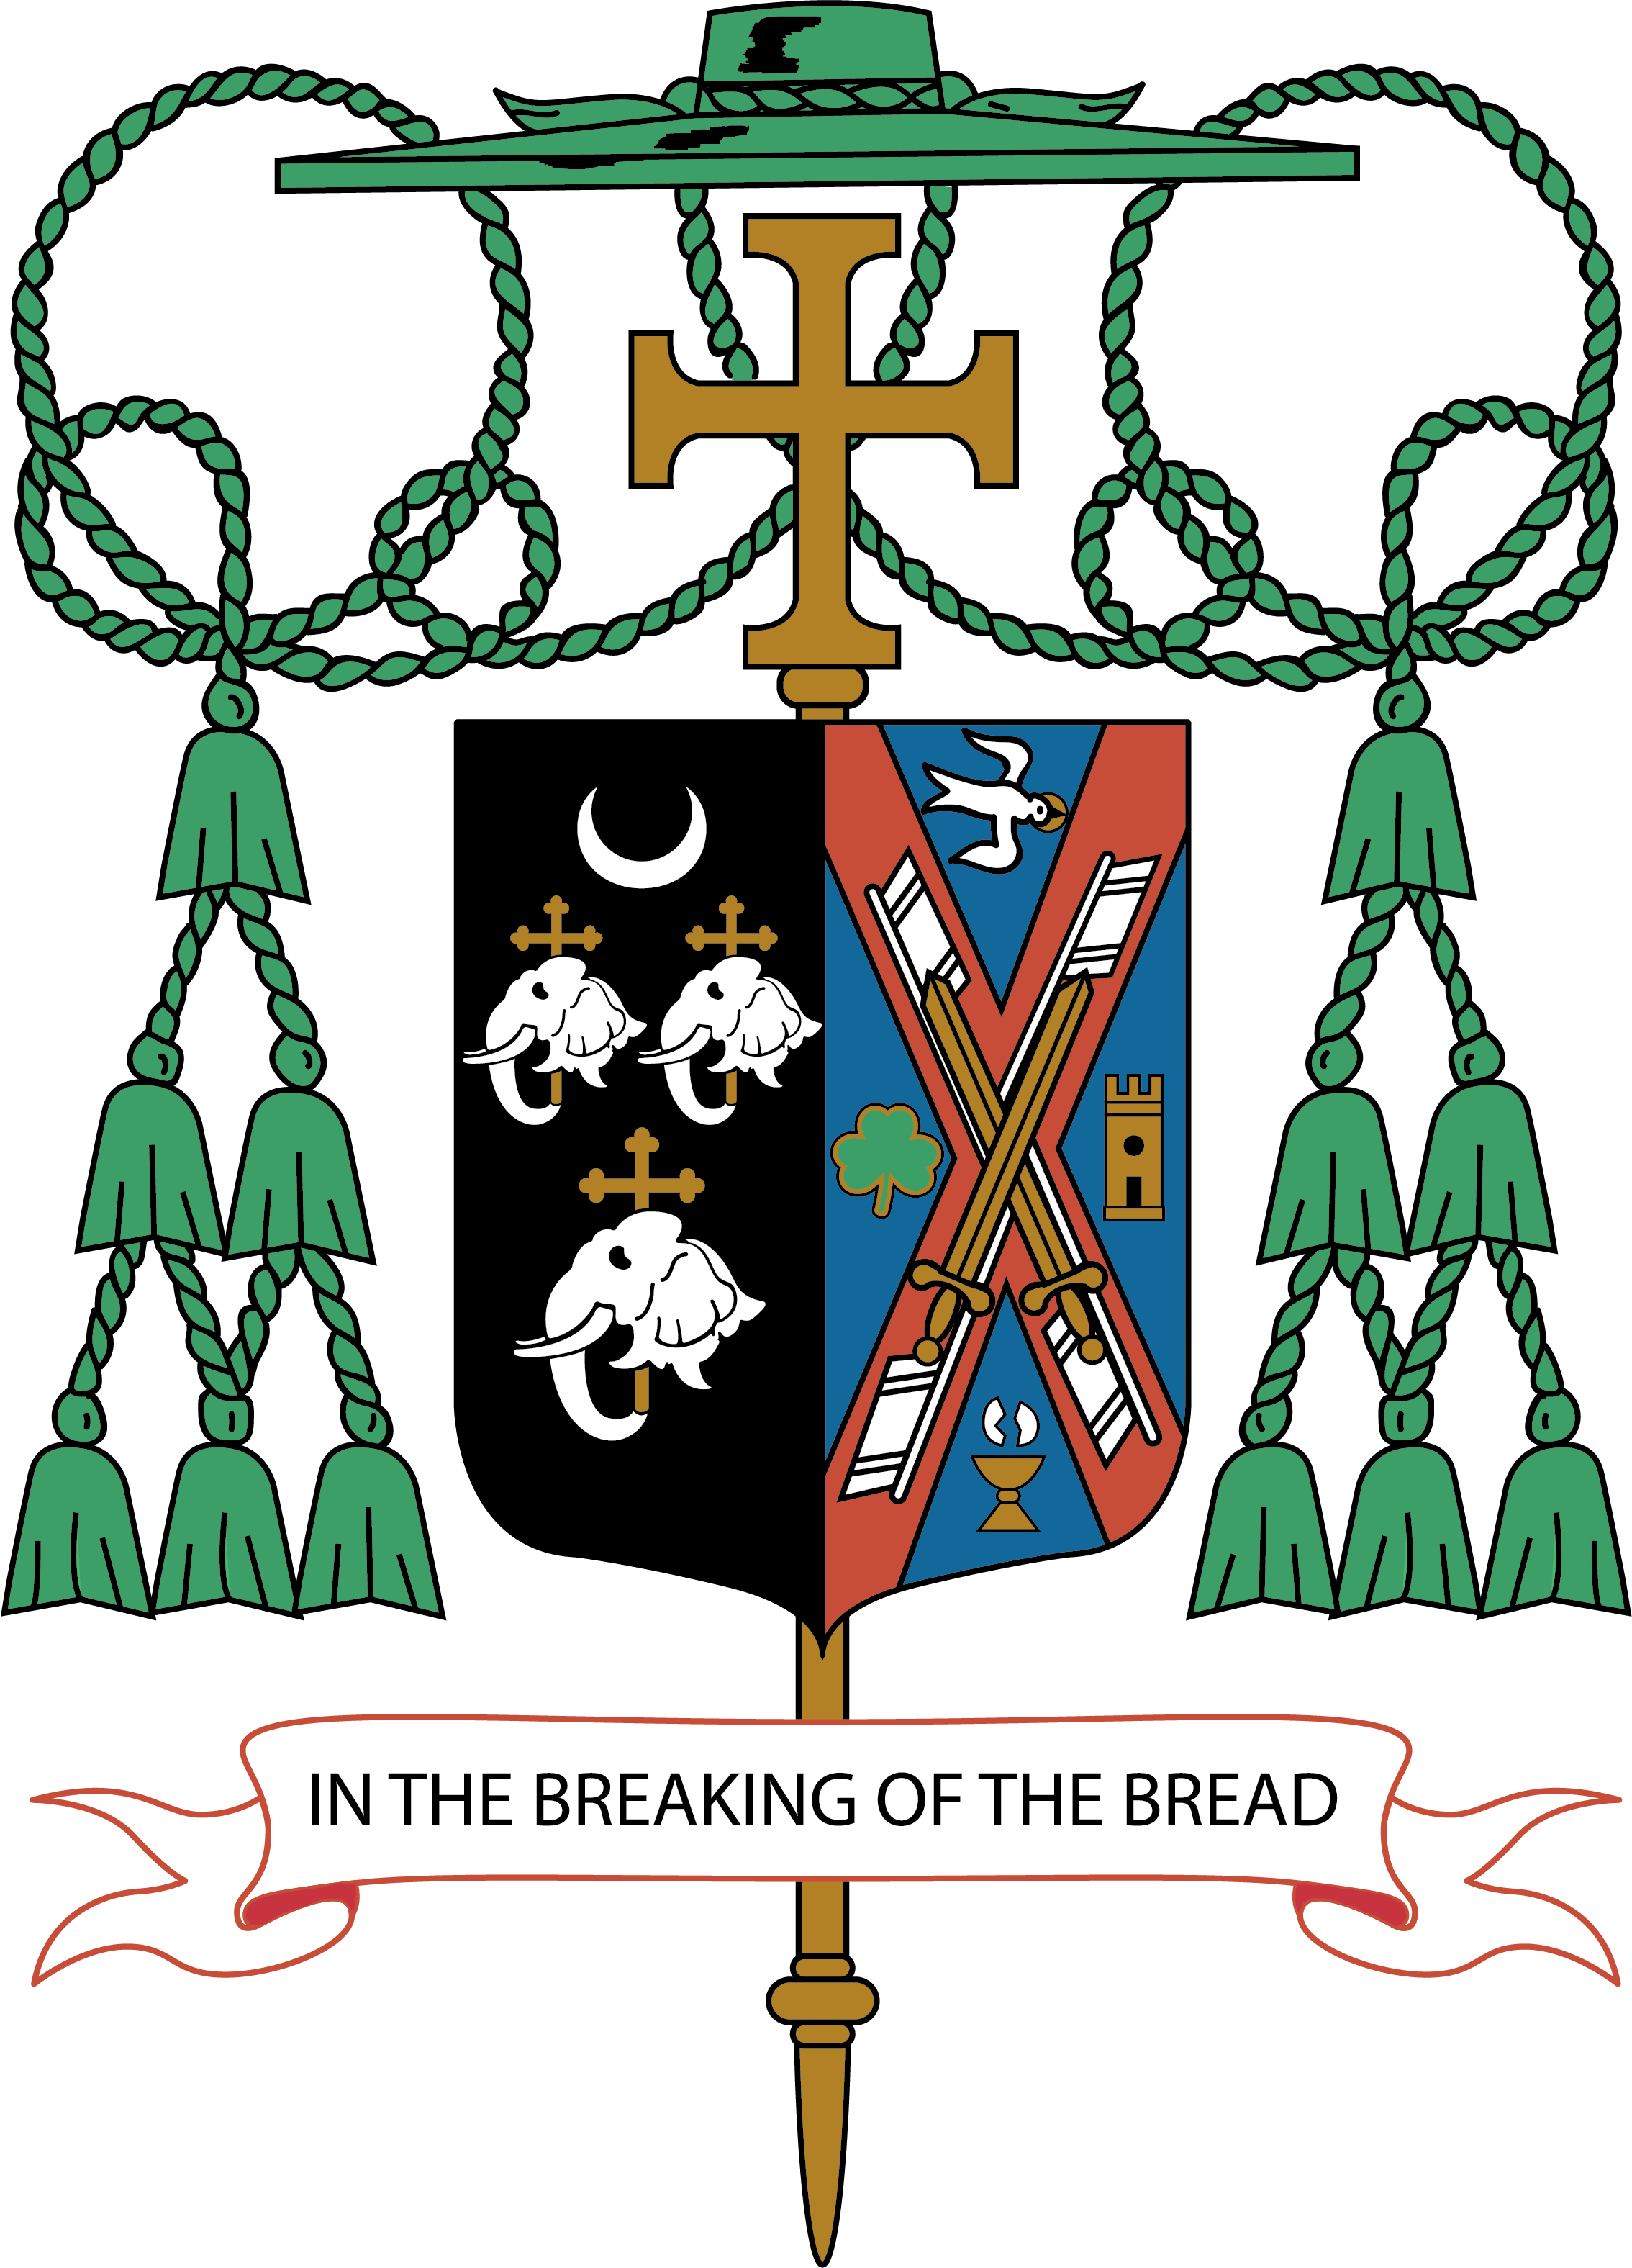 Diocese of camden bishop sullivan coat of arms bishop sullivan coat of arms buycottarizona